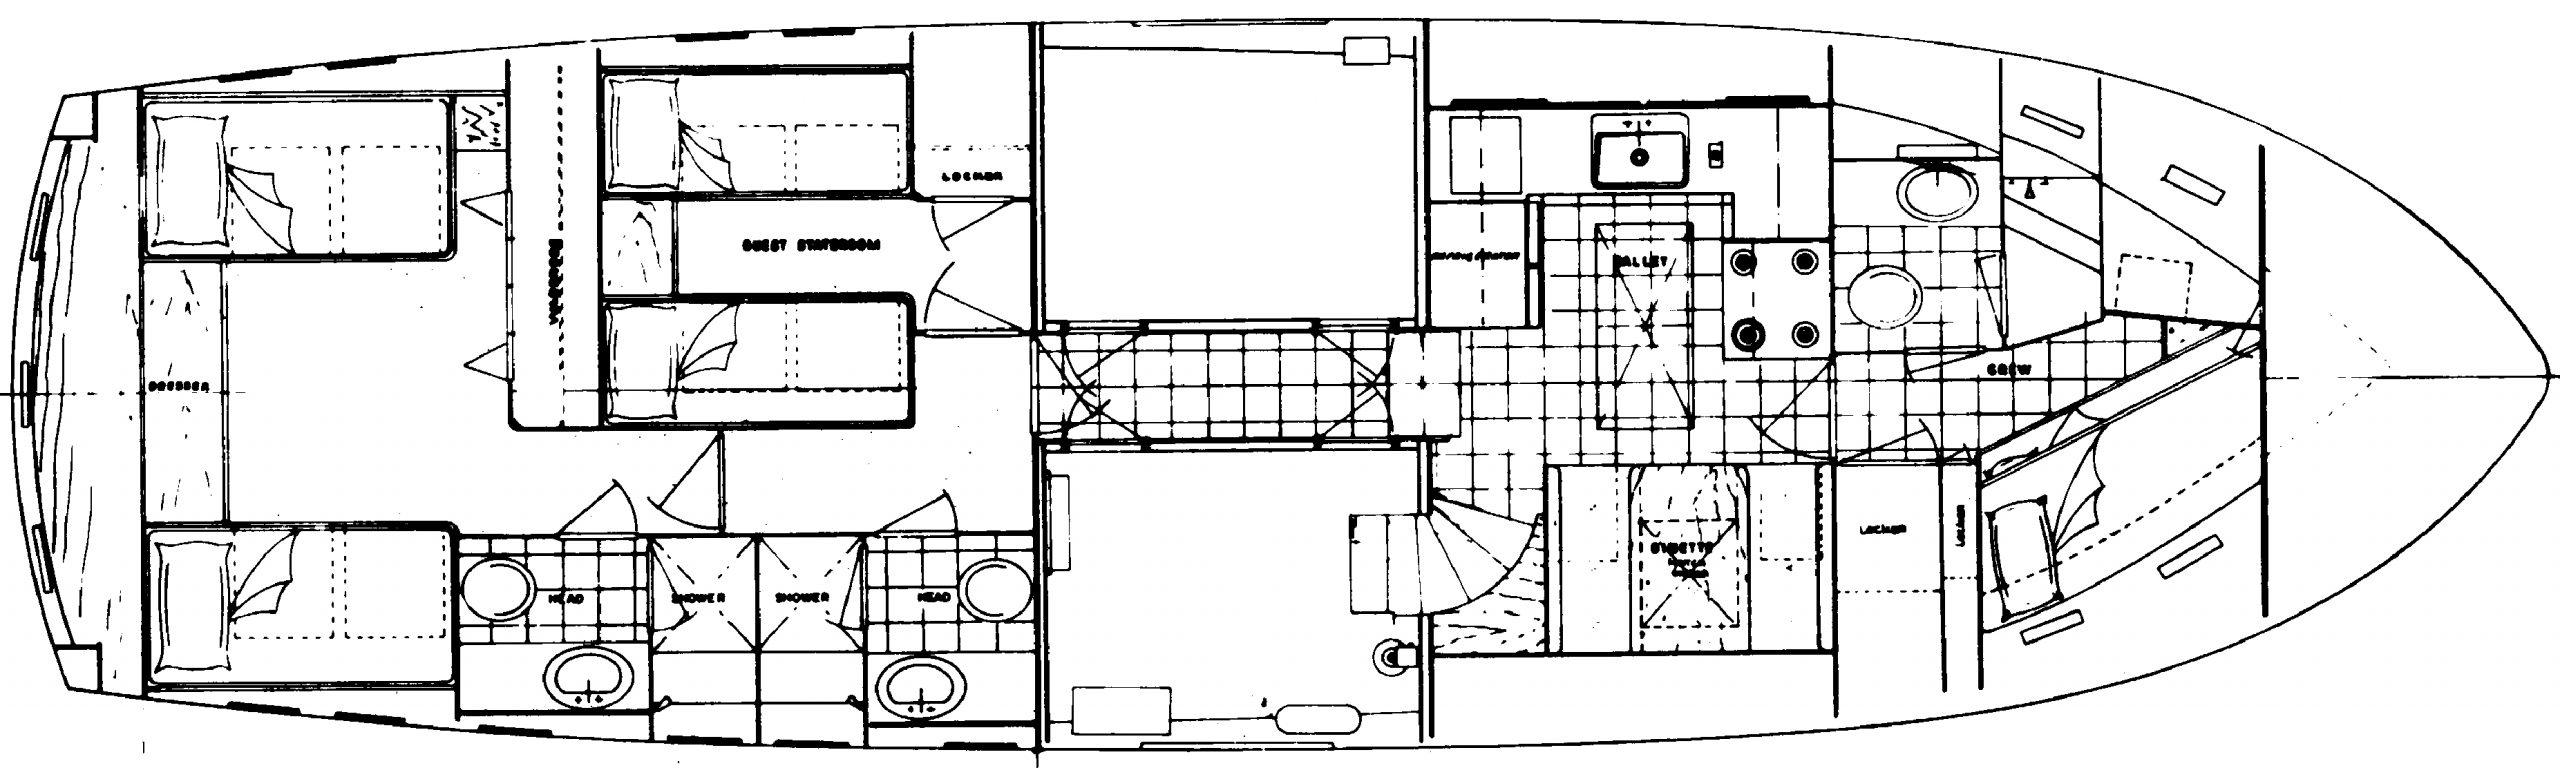 53 Motor Yacht Floor Plan 2